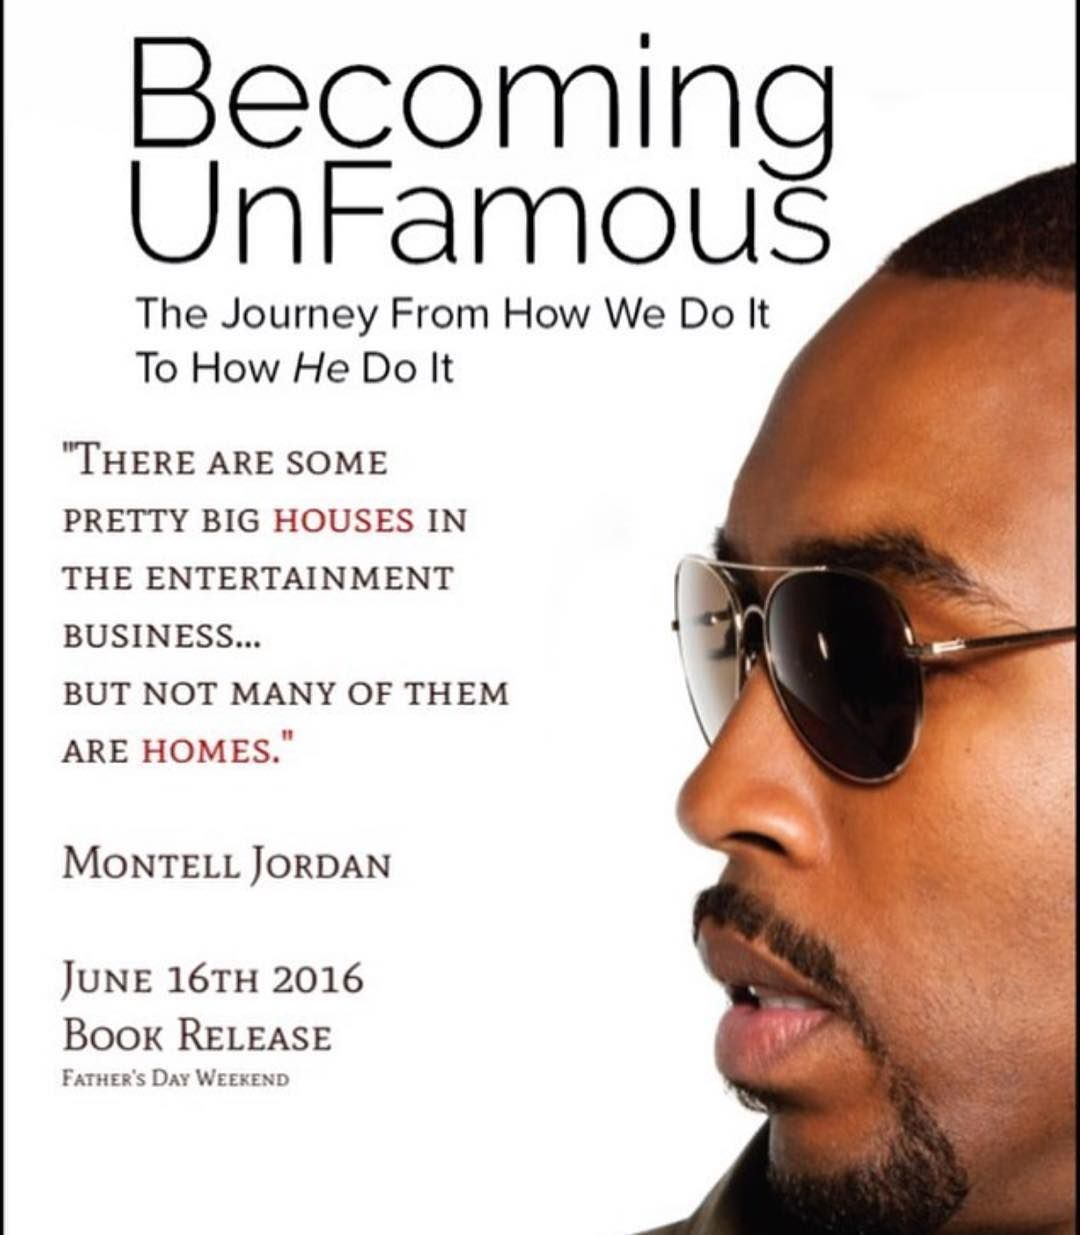 #MontellJordan will release his book #BecomingUnfamous on June 16 IceCreamConvos.com